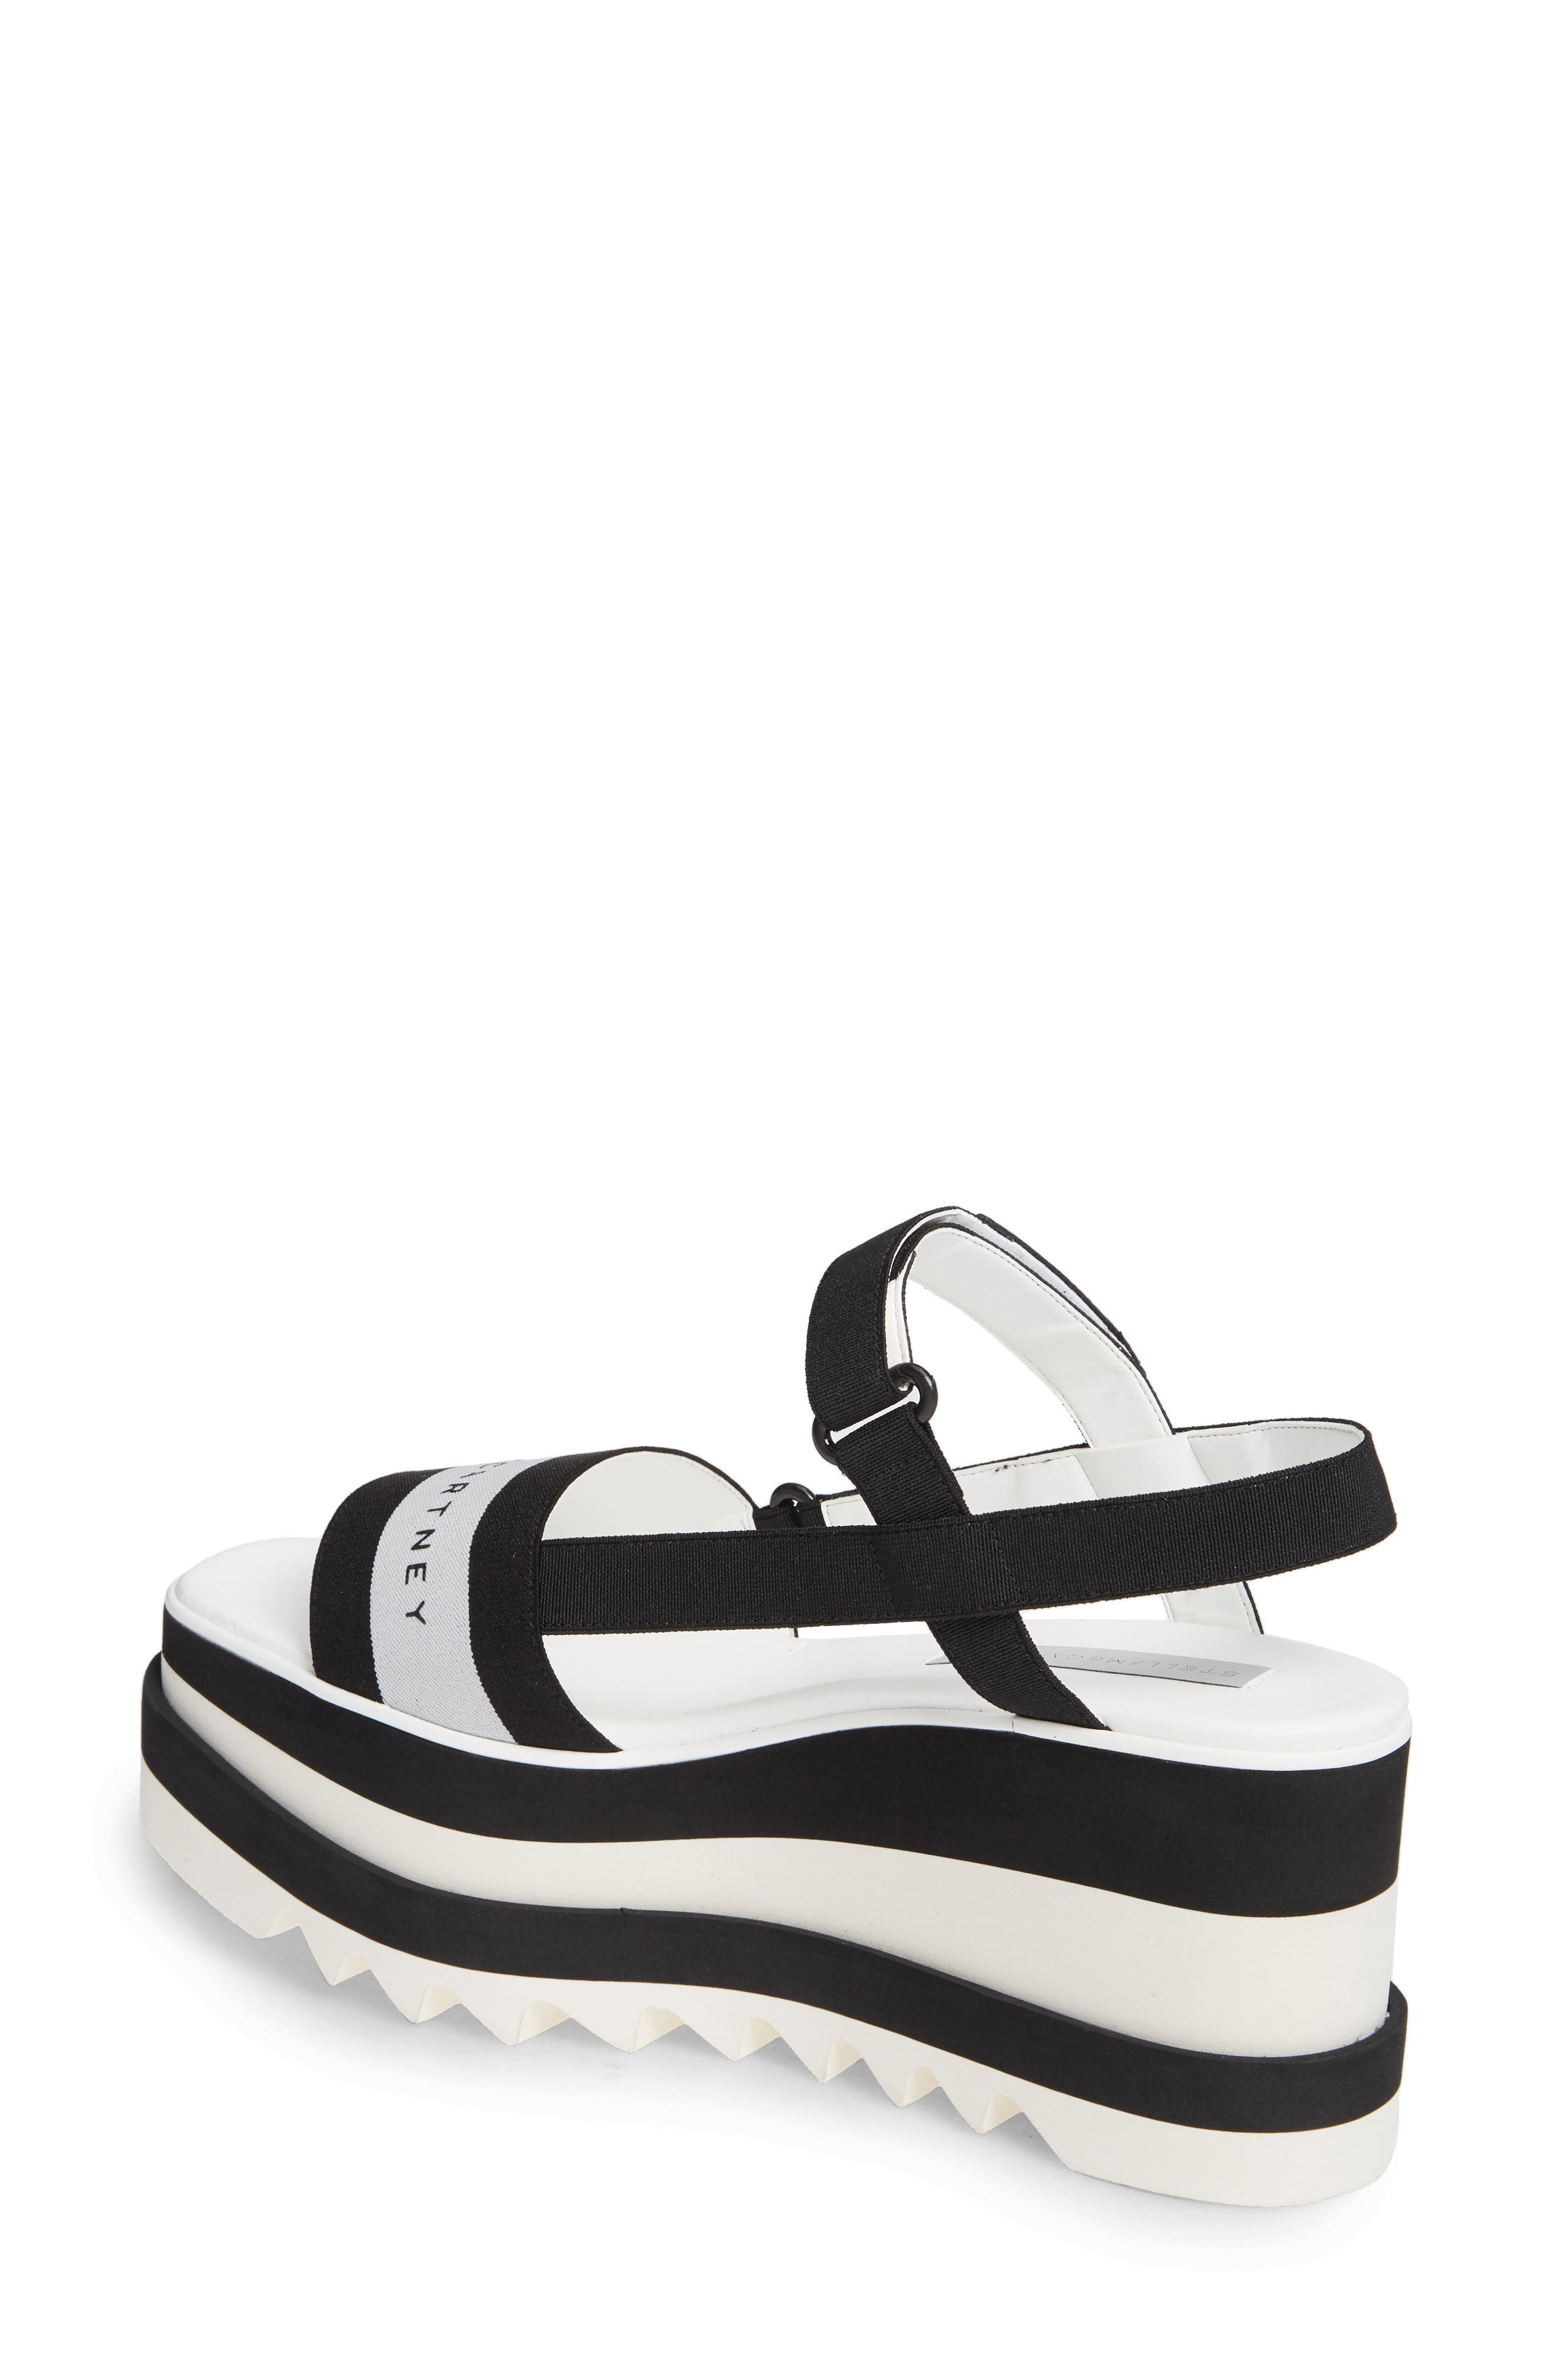 STELLA MCCARTNEY, Stripe Logo Platform Sandal, Alternate thumbnail 2, color, BLACK/ WHITE